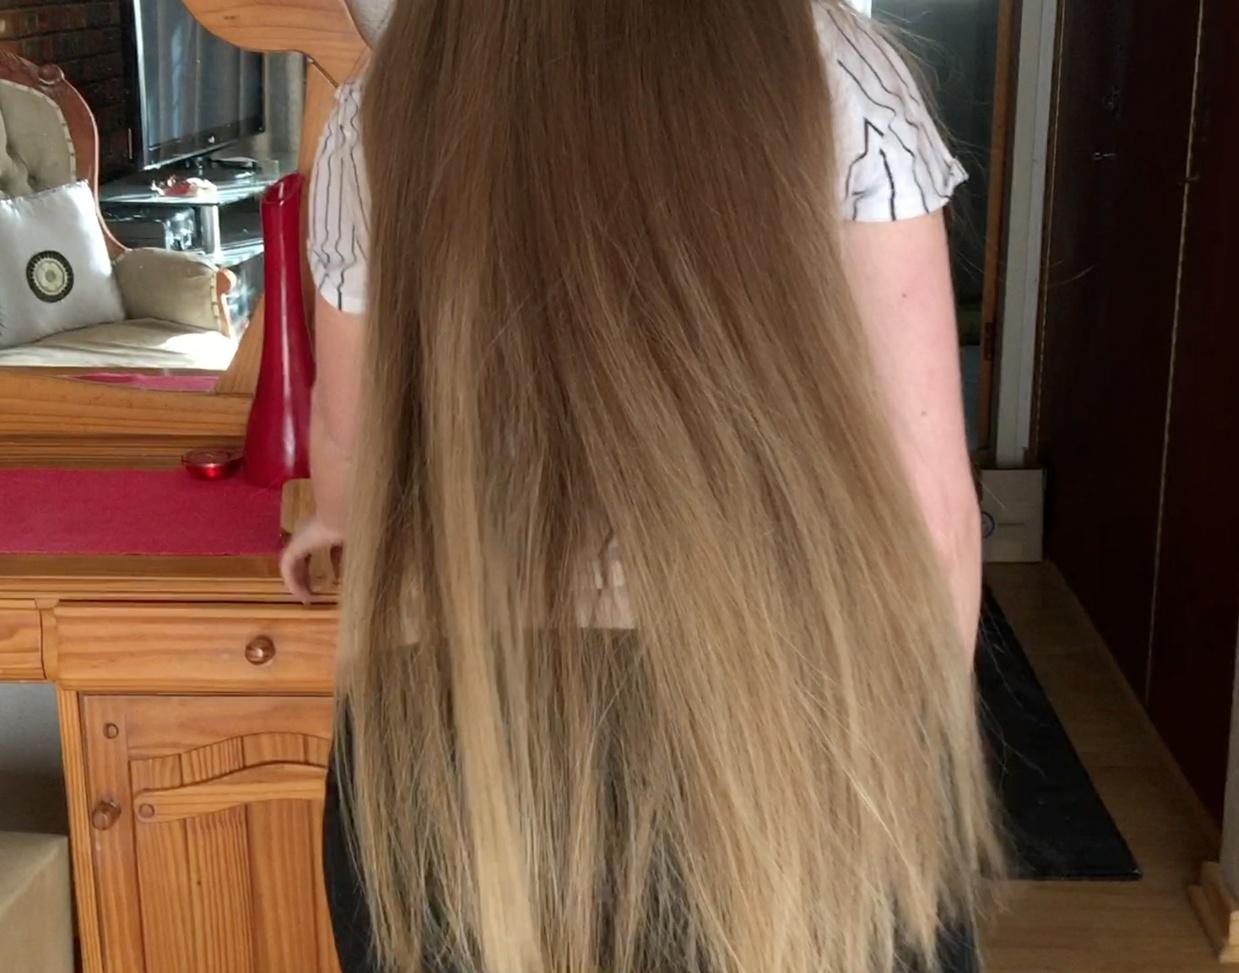 VIDEO - Perfect blonde tailbone length hair